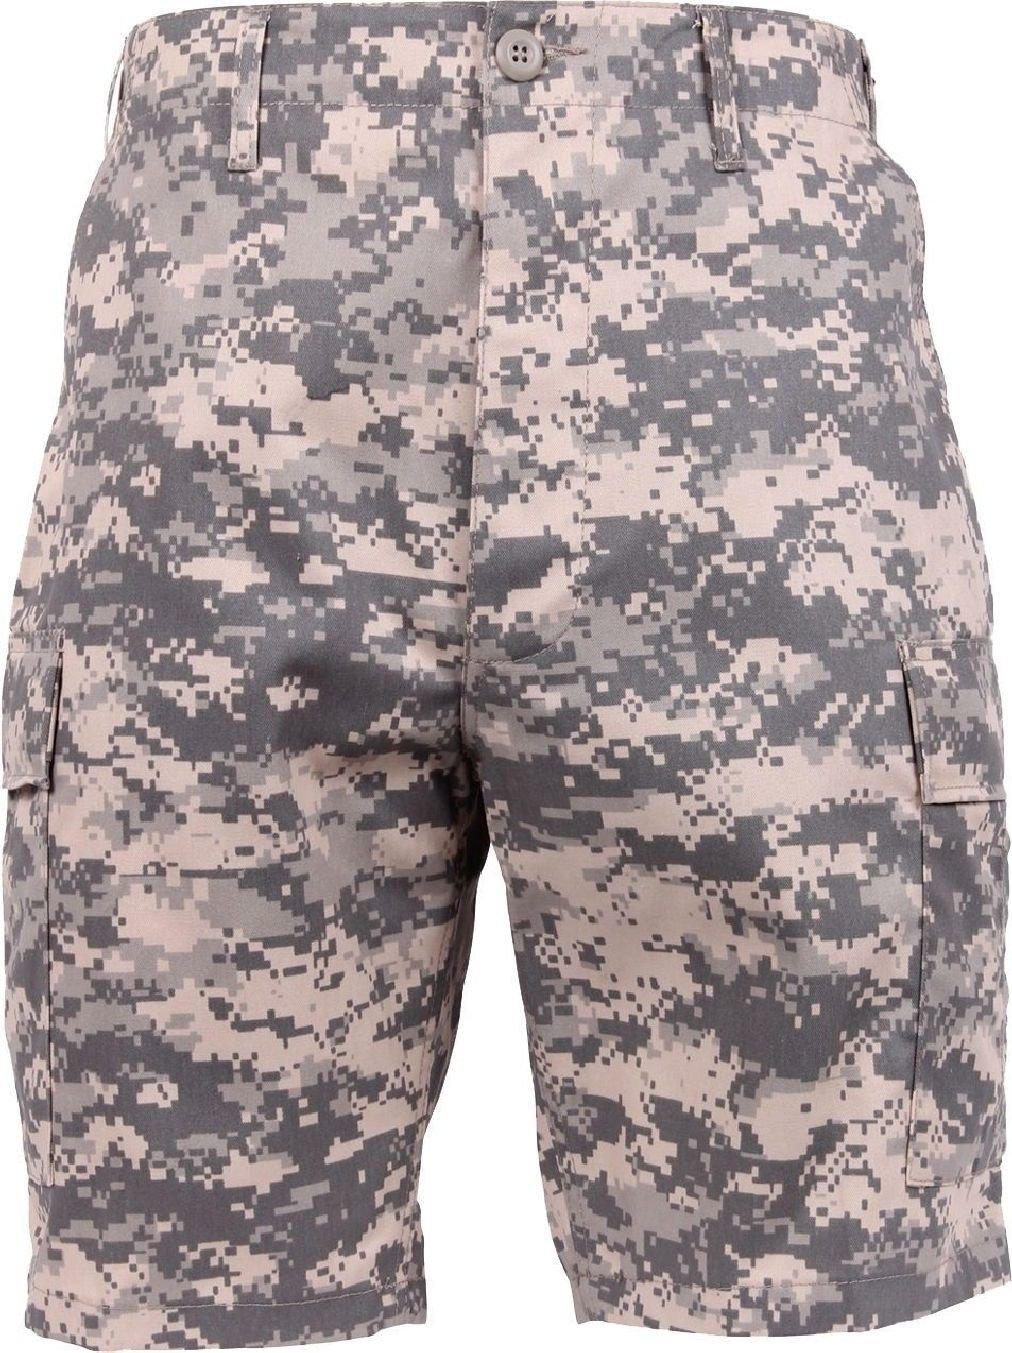 Mens ACU Digital Camouflage Military BDU Cargo Shorts